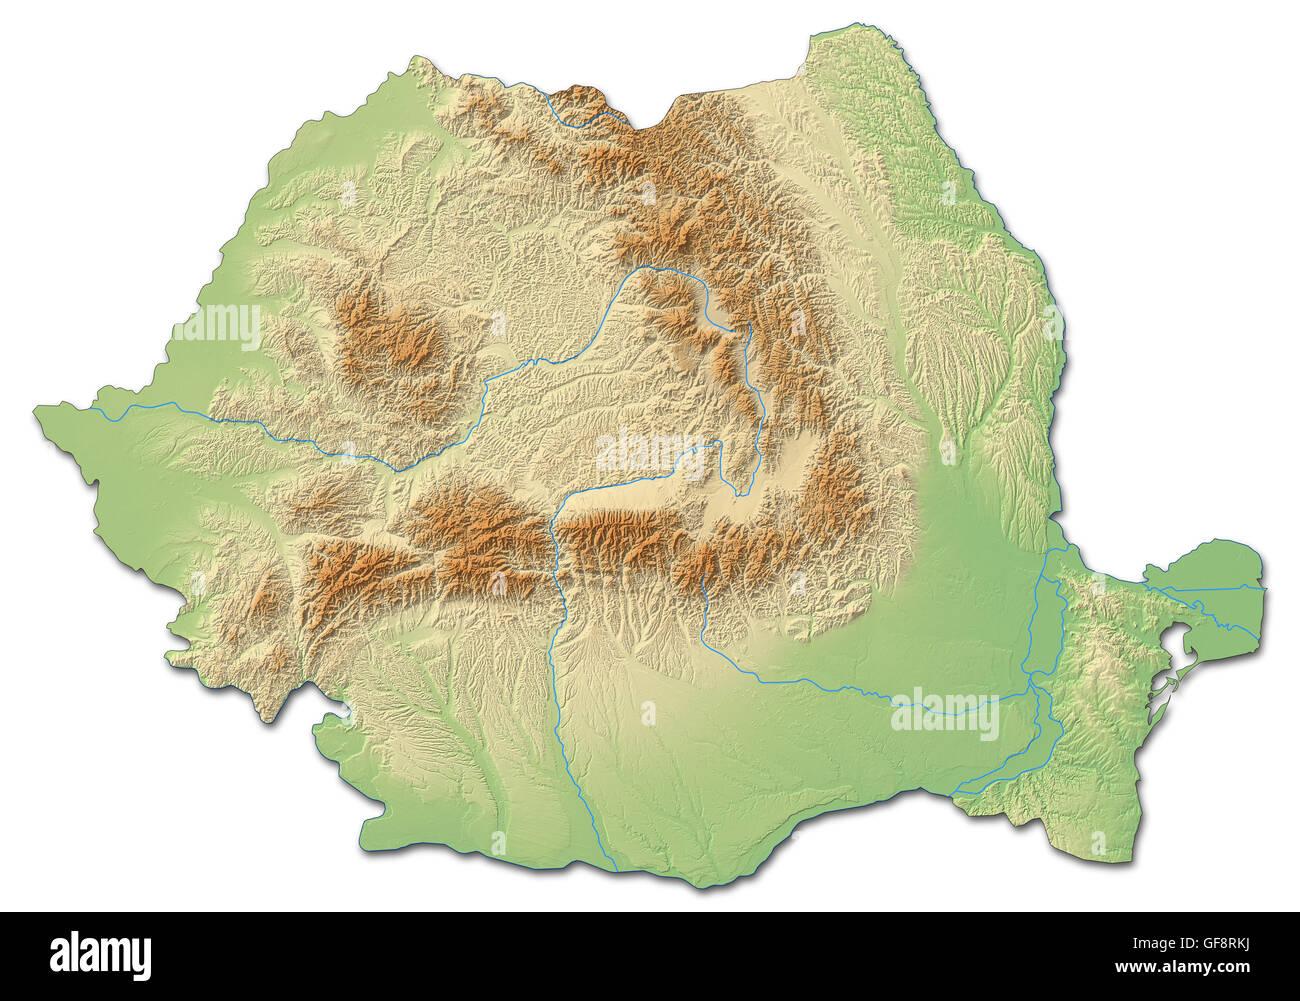 Romania map relief atlas stock photos romania map relief atlas relief map of romania with shaded relief stock image gumiabroncs Choice Image